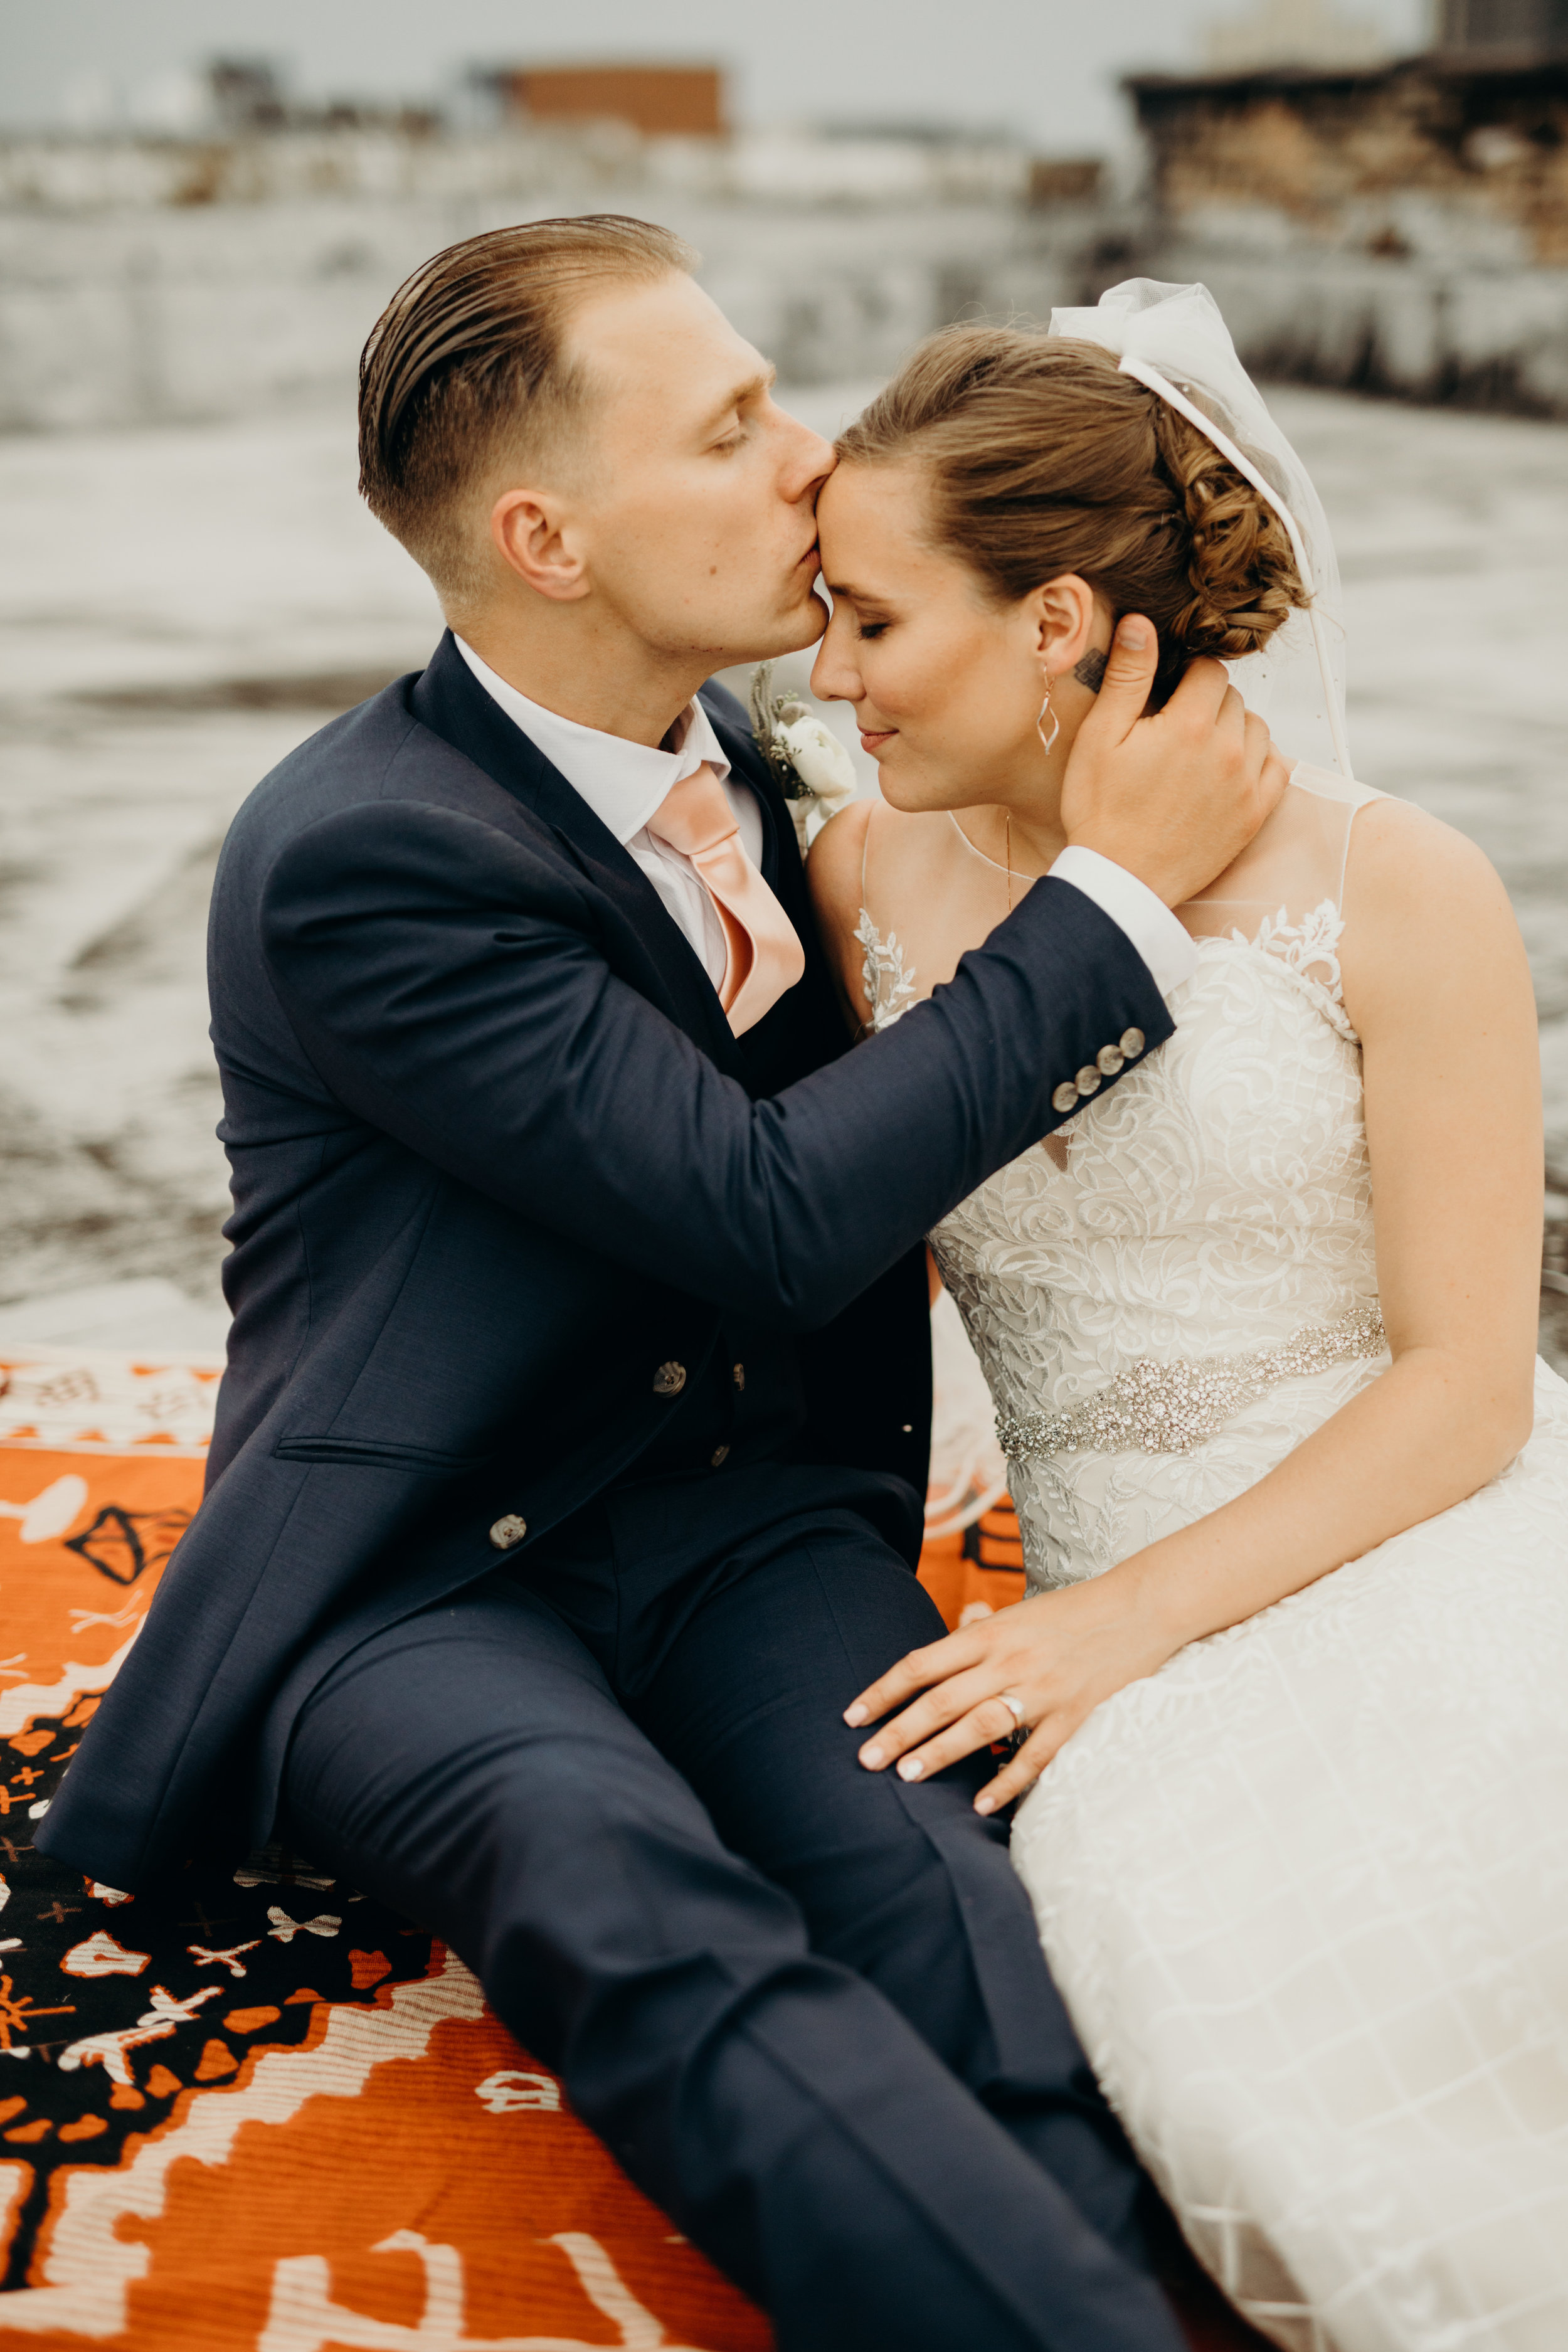 Vintage Wedding_Polly C Photography_20171726182736.jpg